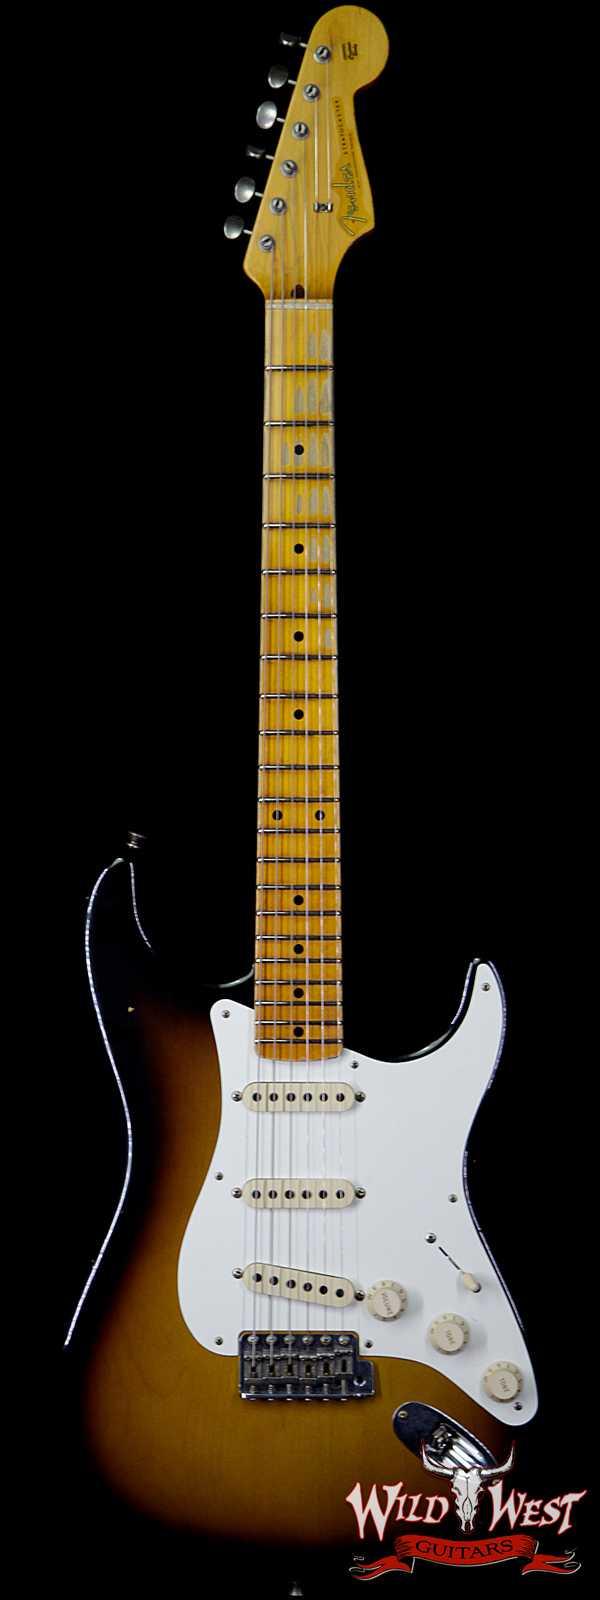 Fender Custom Shop 1957 Stratocaster Journeyman Relic with Dirty Neck 2 Tone Sunburst